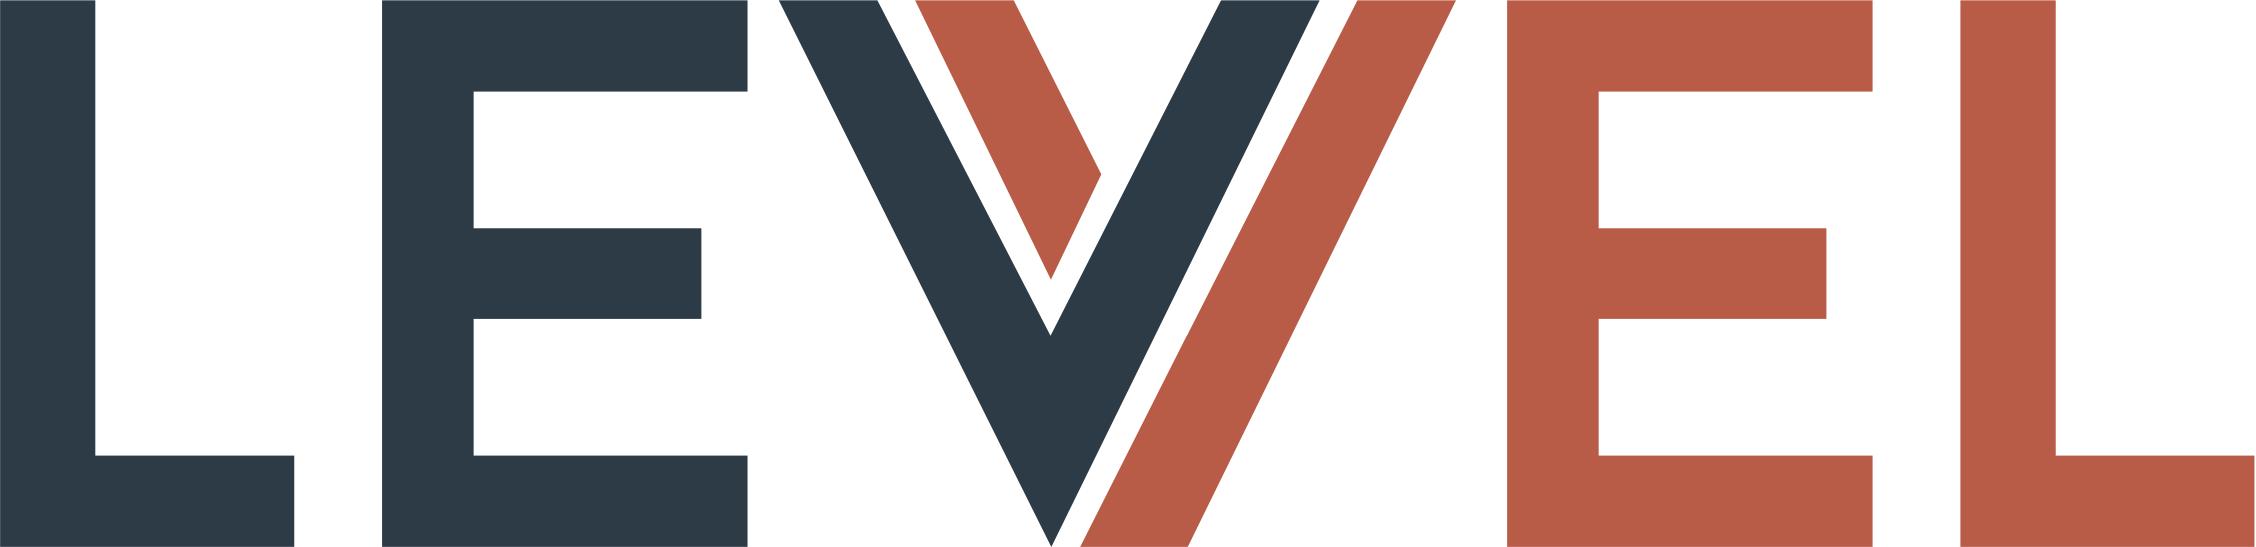 levvel-logo-dark PNG.png